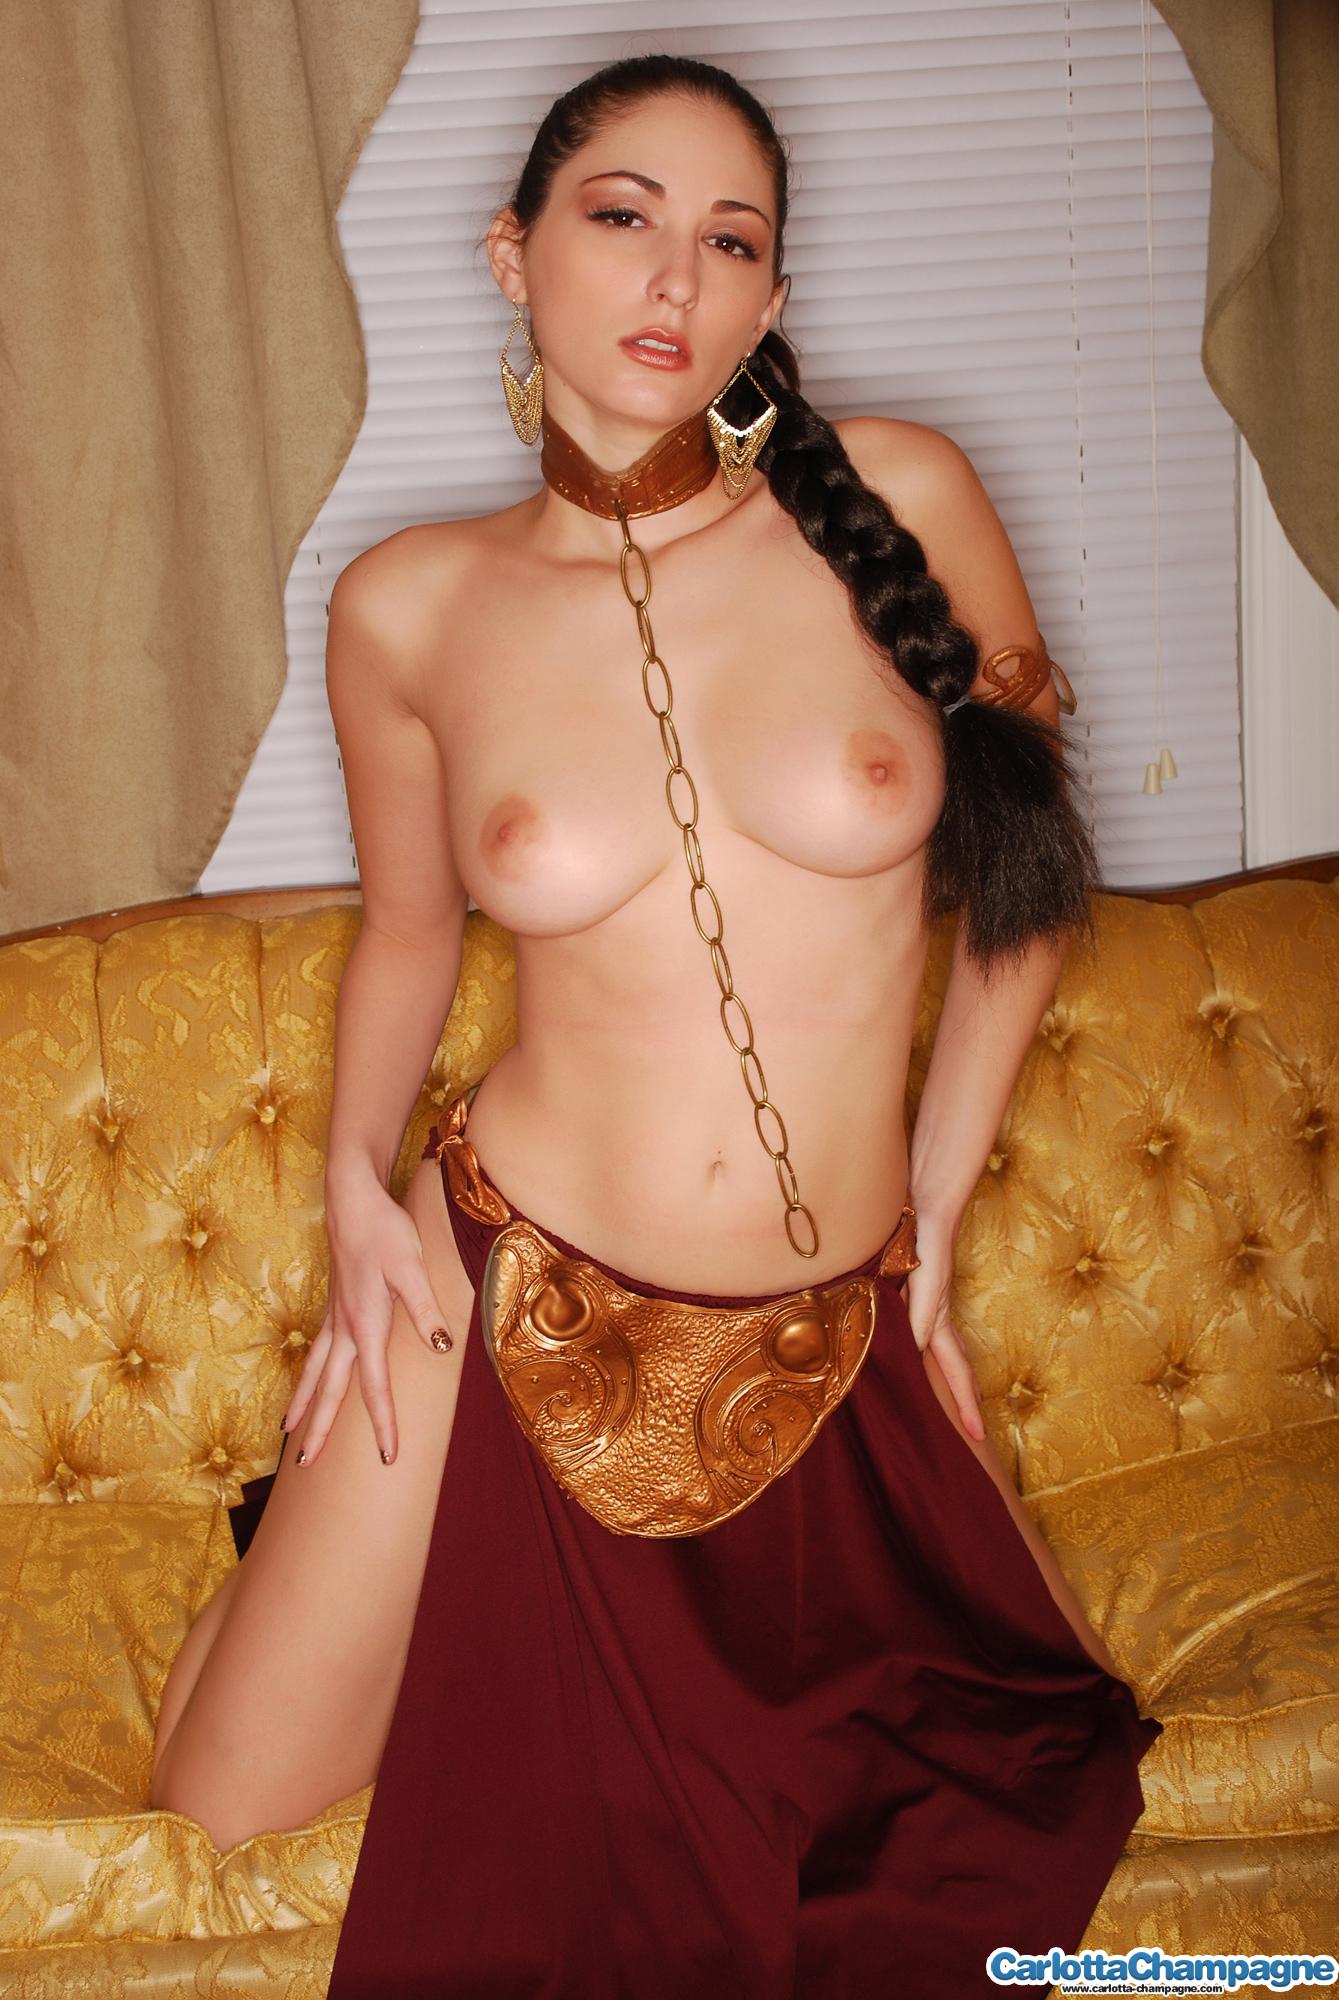 Pricess leias porn galleries sexy videos